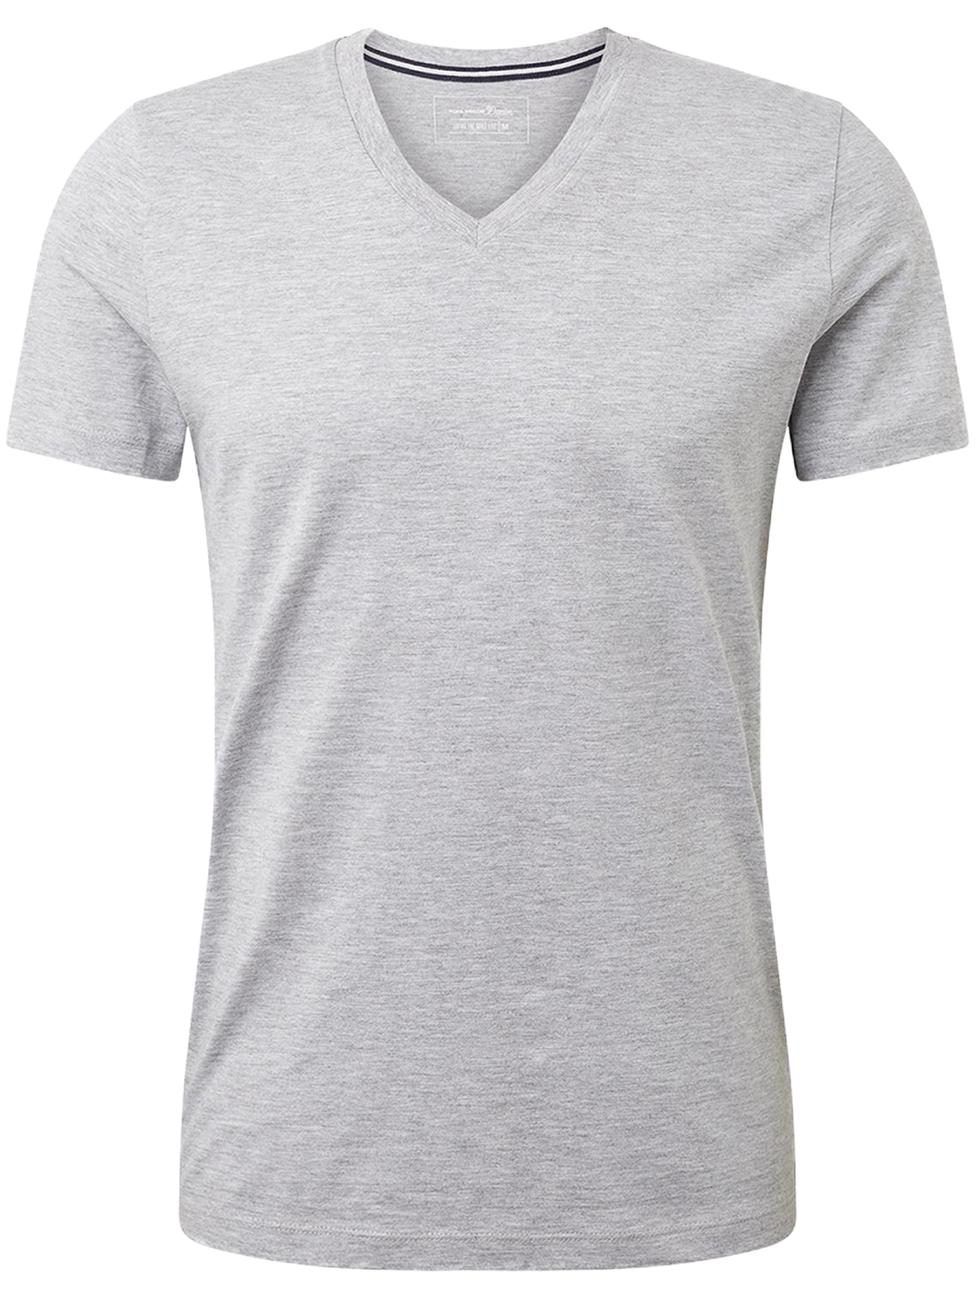 tom-tailor-denim-herren-t-shirt-mit-v-ausschnitt